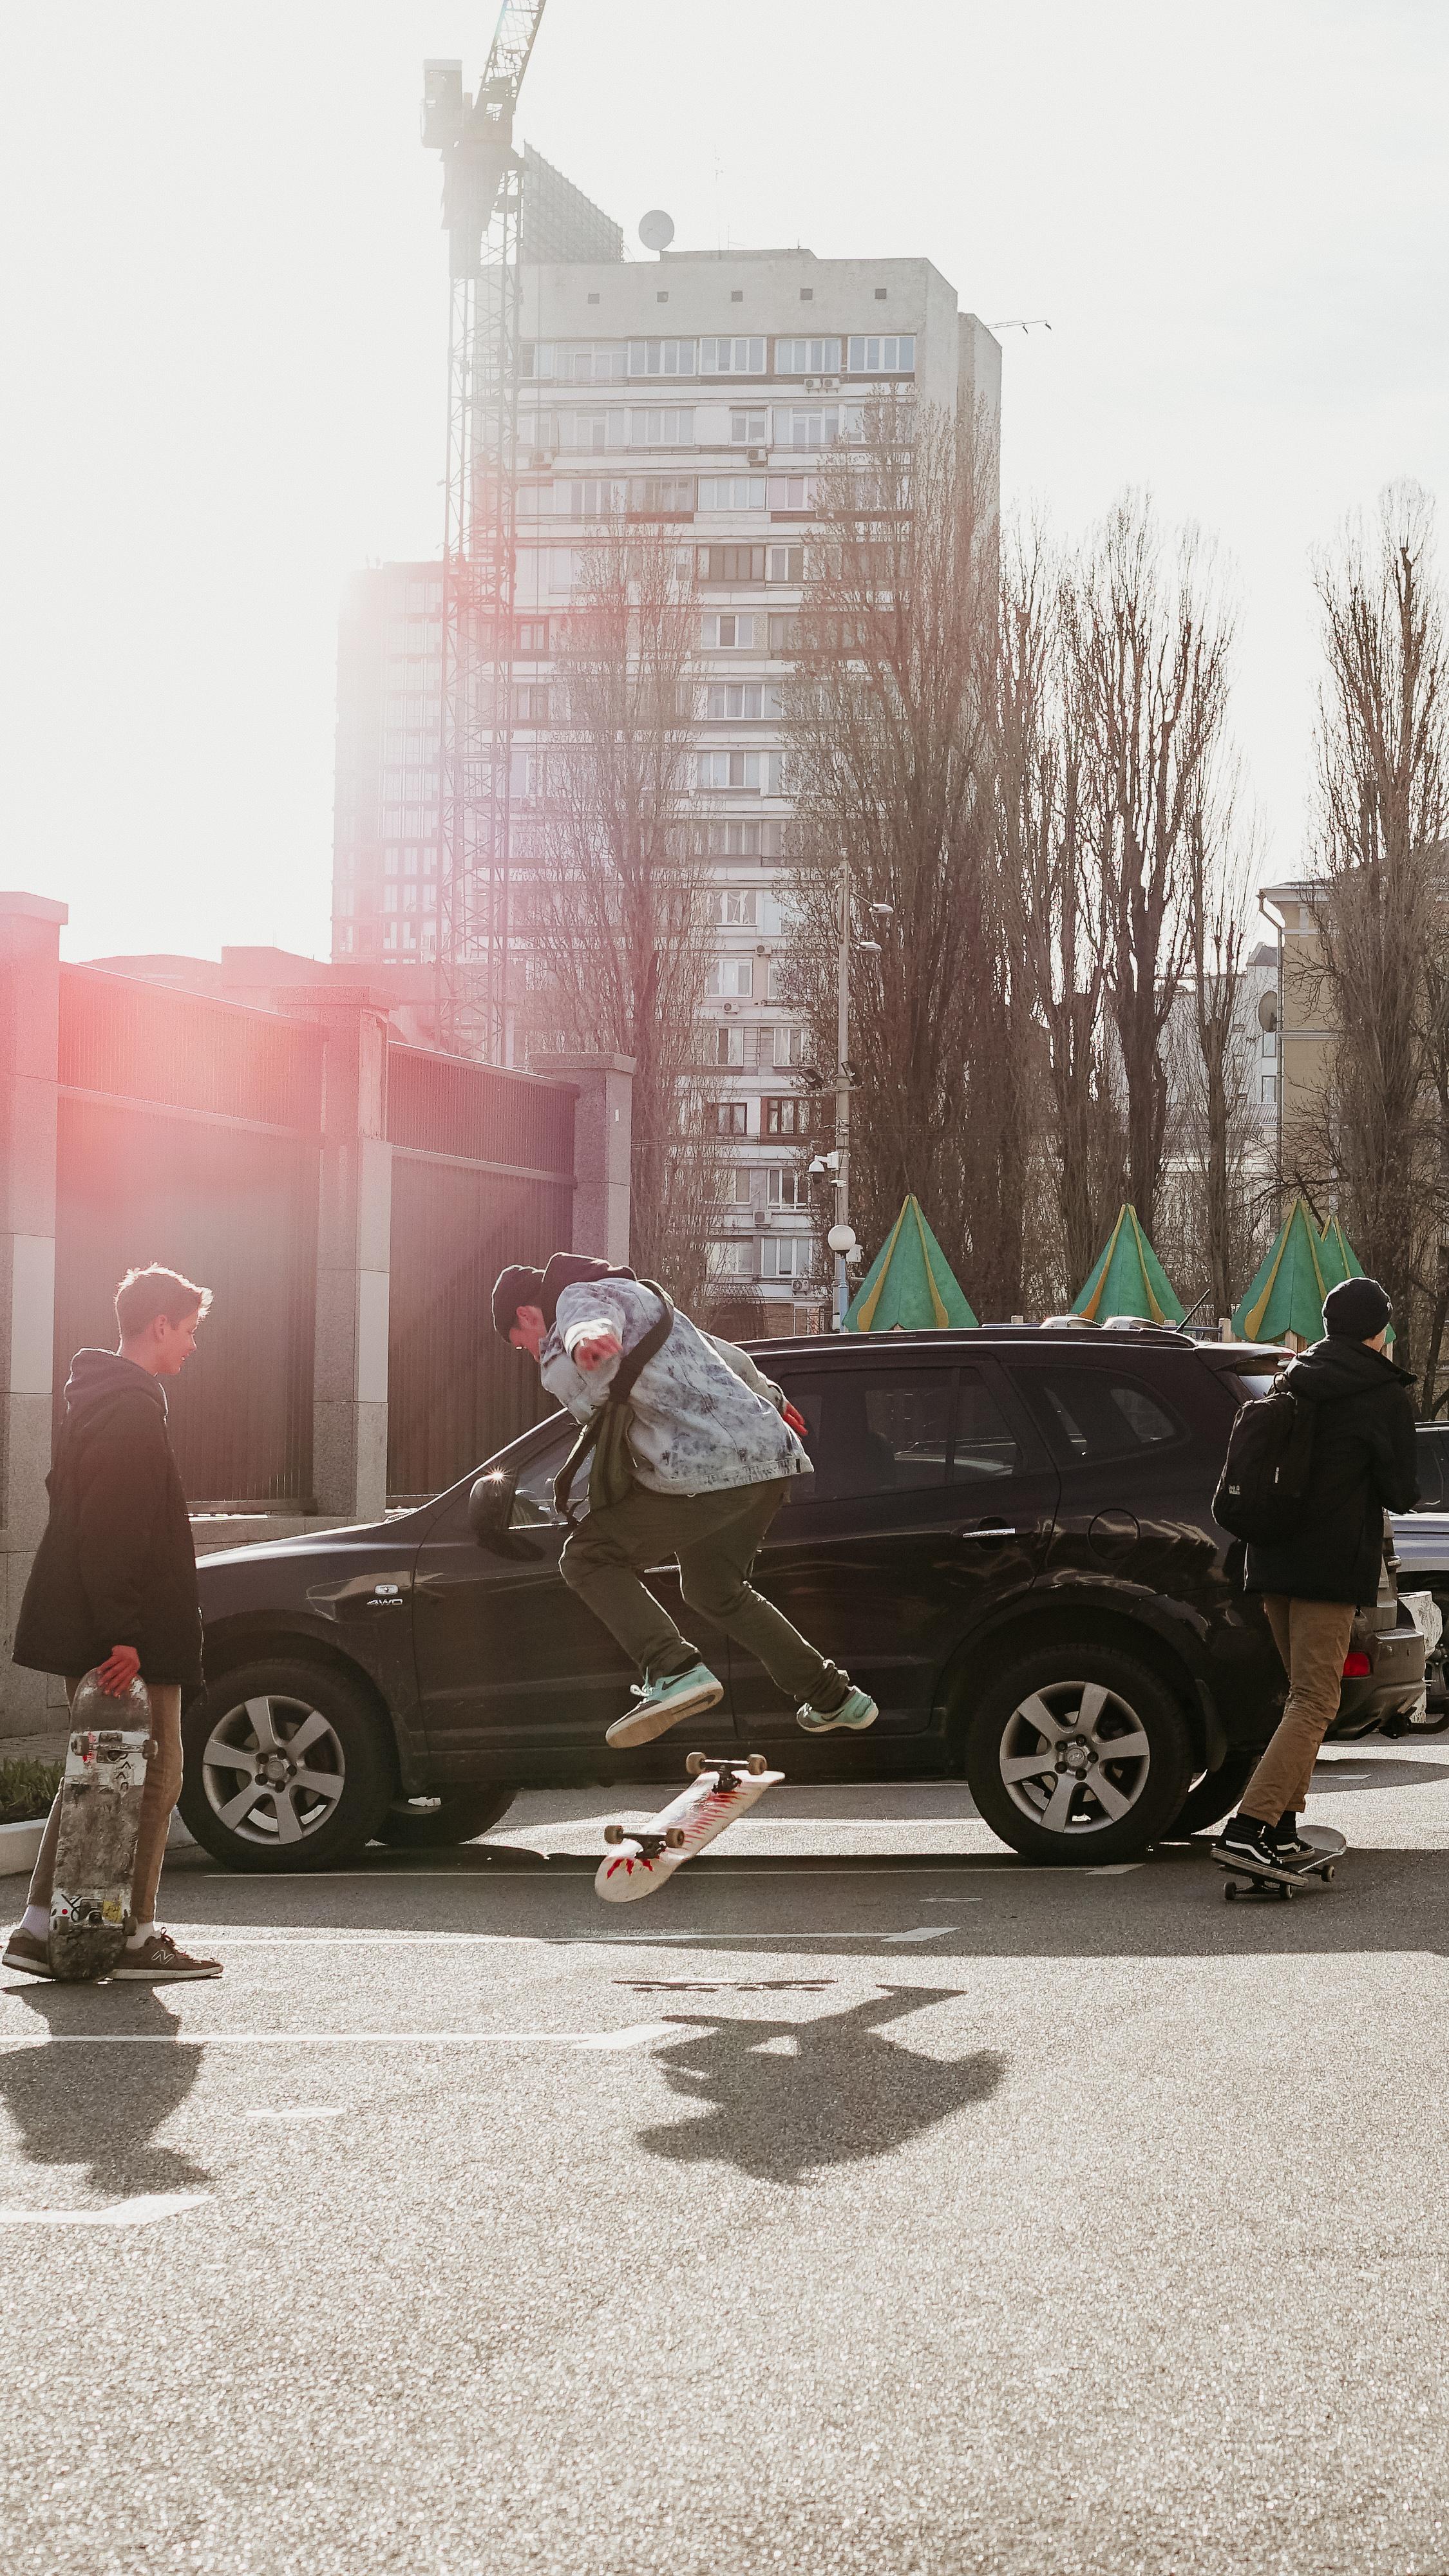 Man Jumping over Skateboard Beside Vehicle